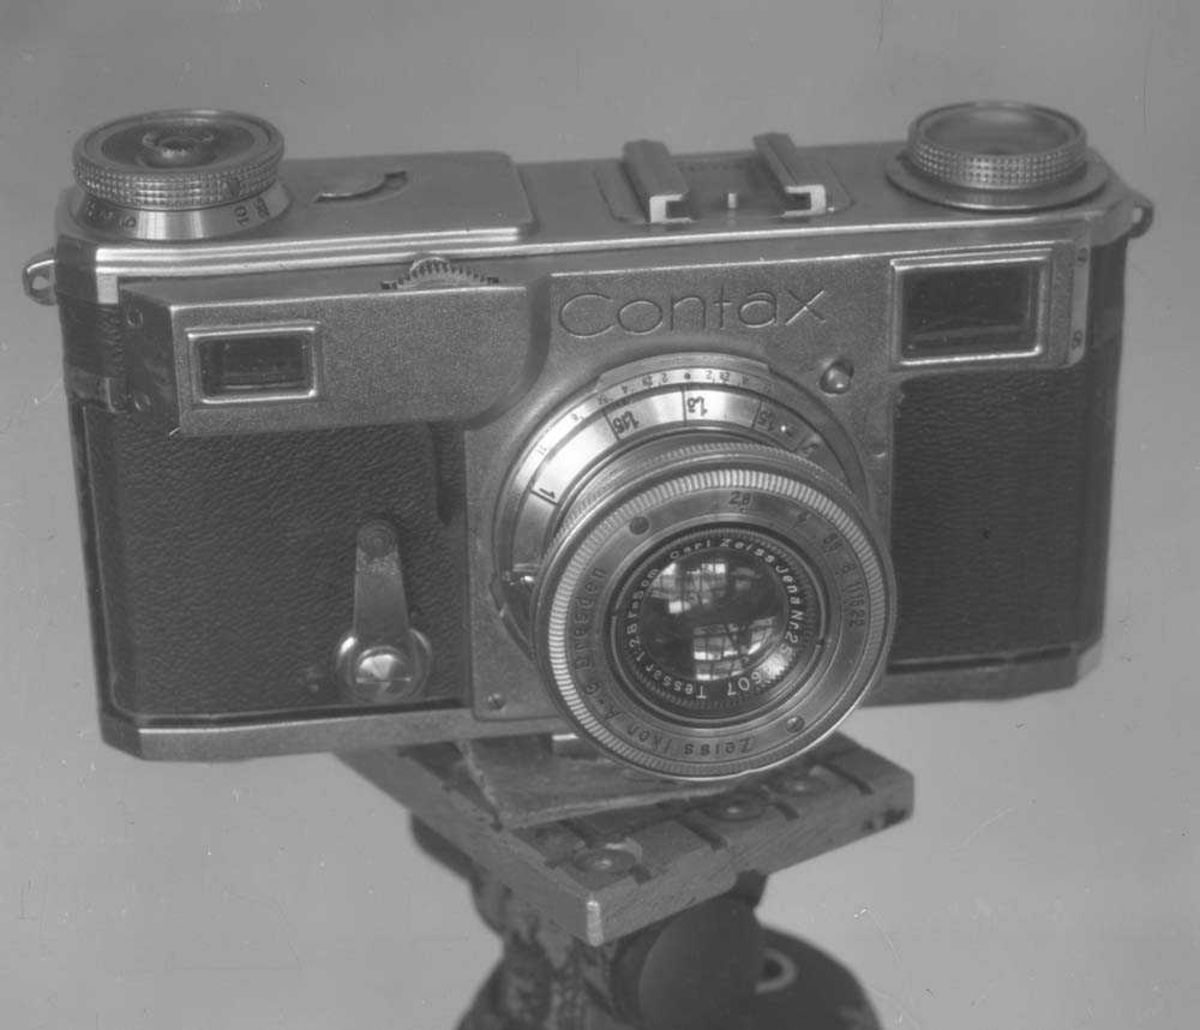 Fotografiapparat (fotoapparat) type Contax.